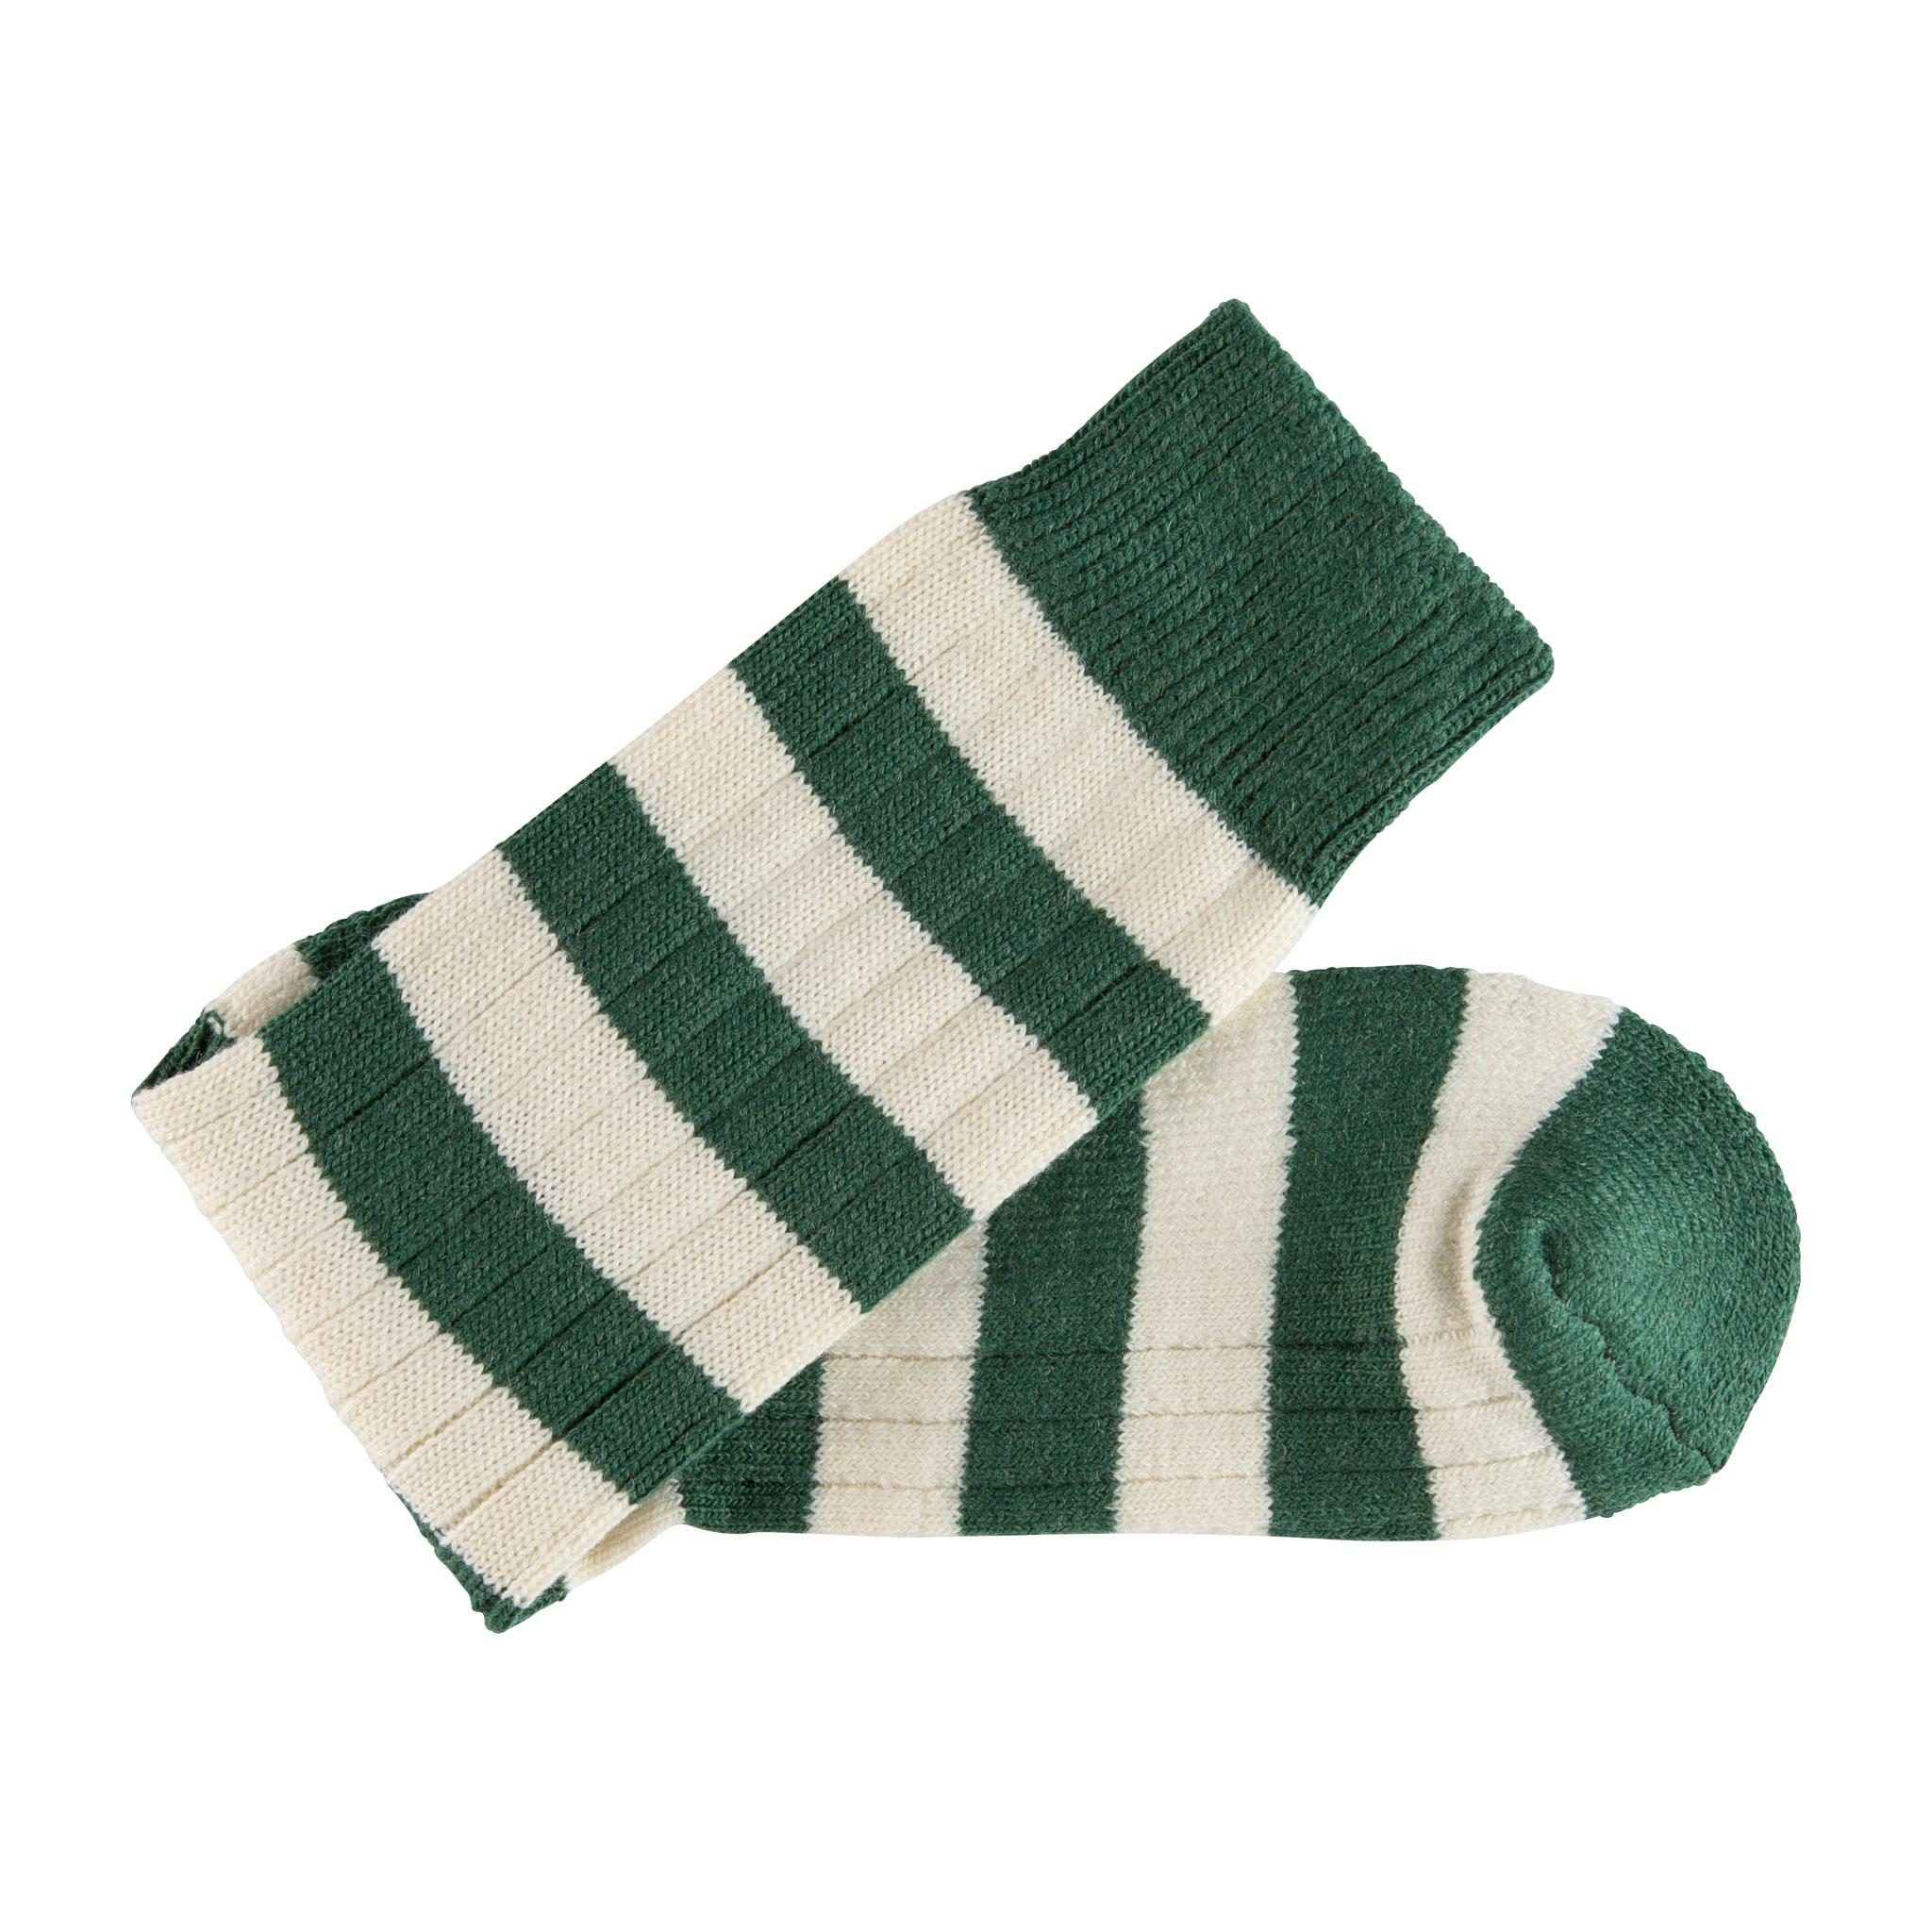 West Kent Heritage Merino Wool green and white stripe sock - folded